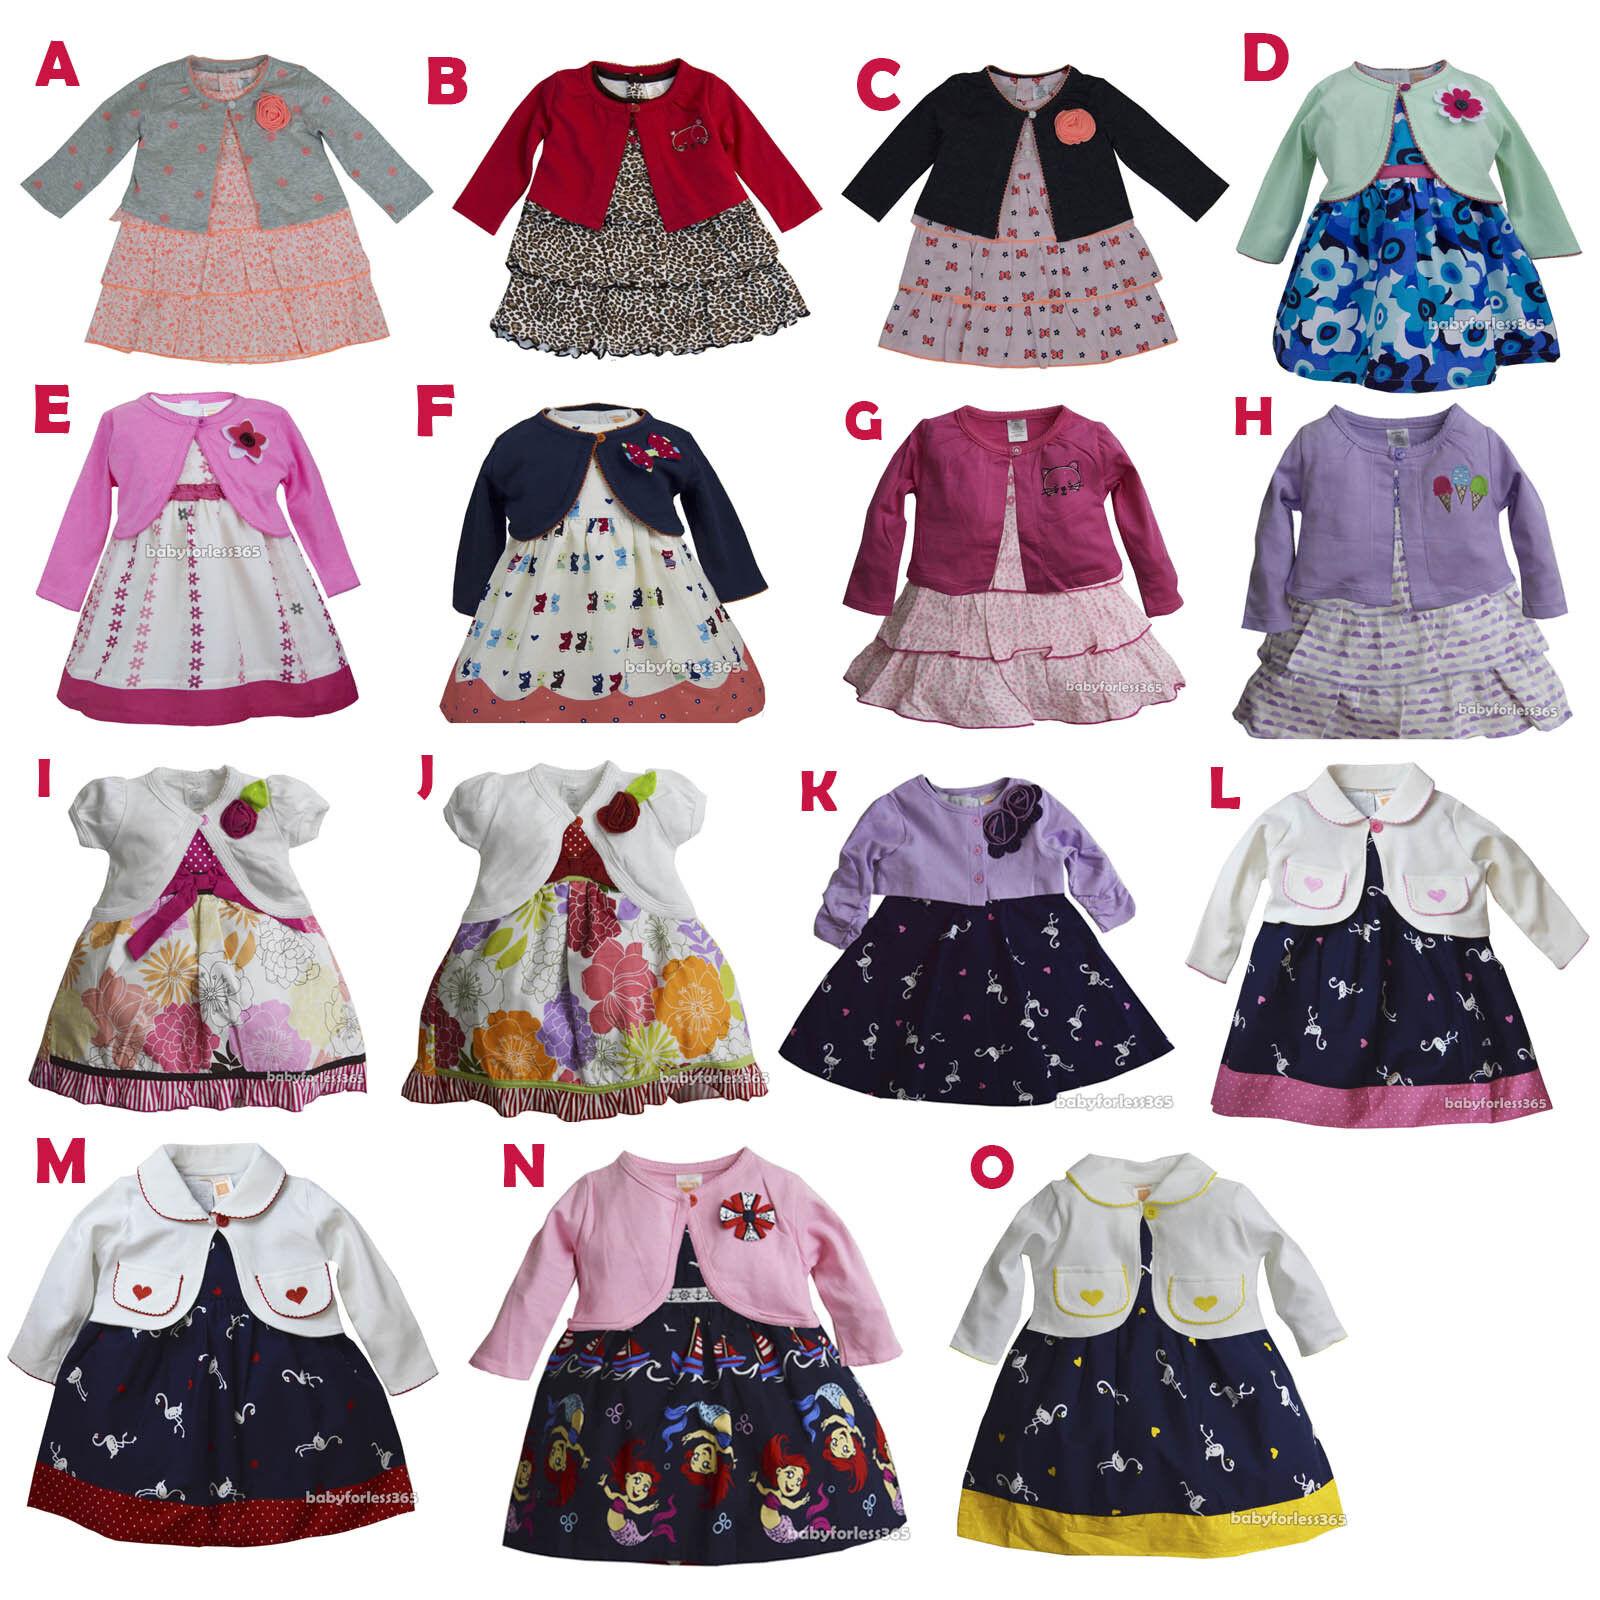 New Ashley baby girls dress cardigan clothing outfit size 3